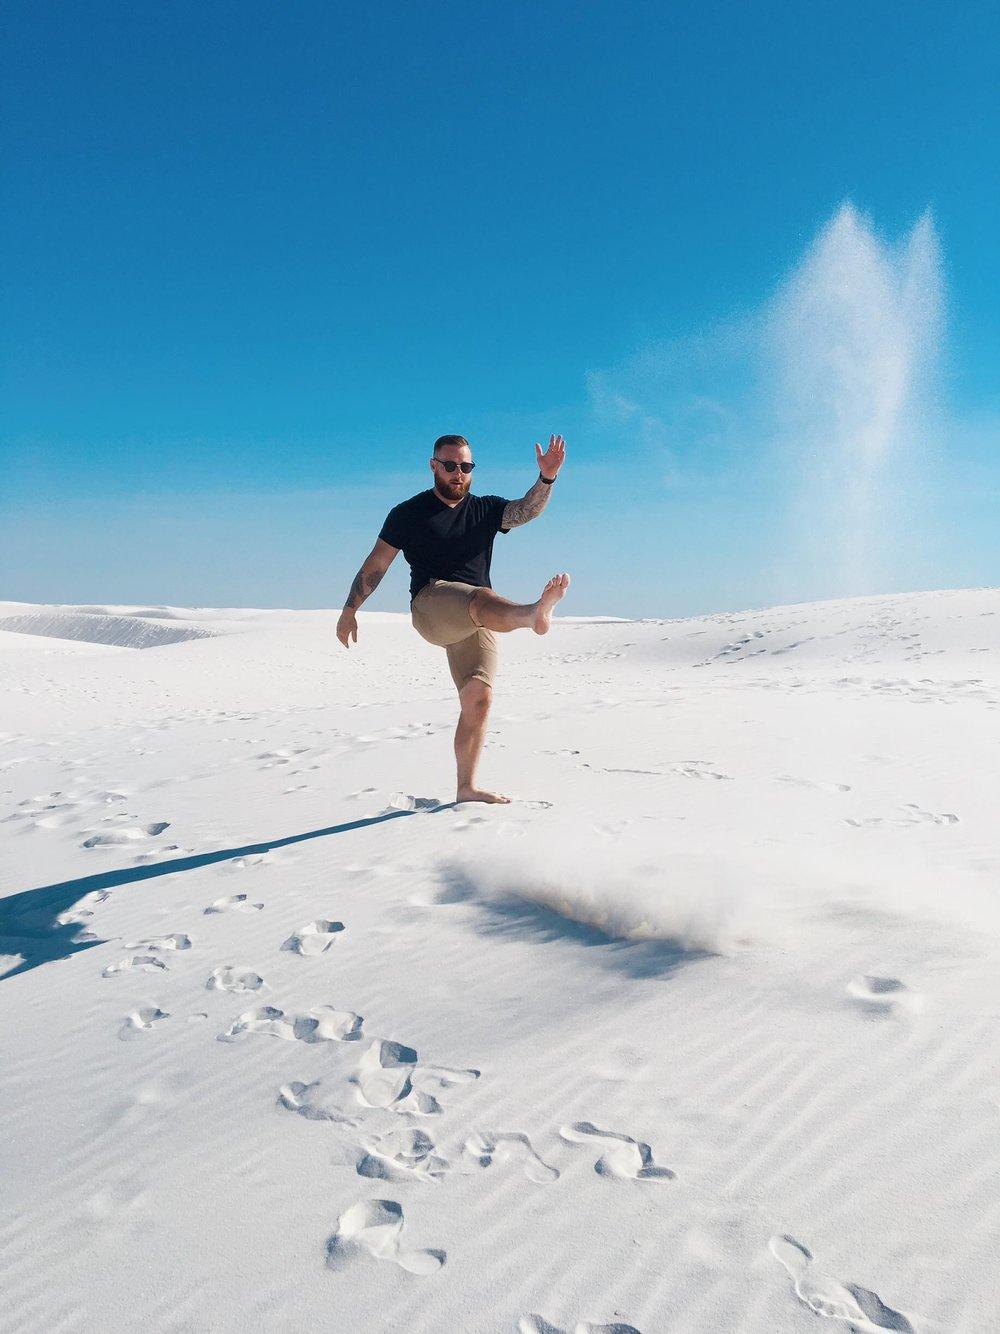 The Worlds Largest Gypsum Sandbox | Kicking Sand | jumpseatjenny | New Mexico